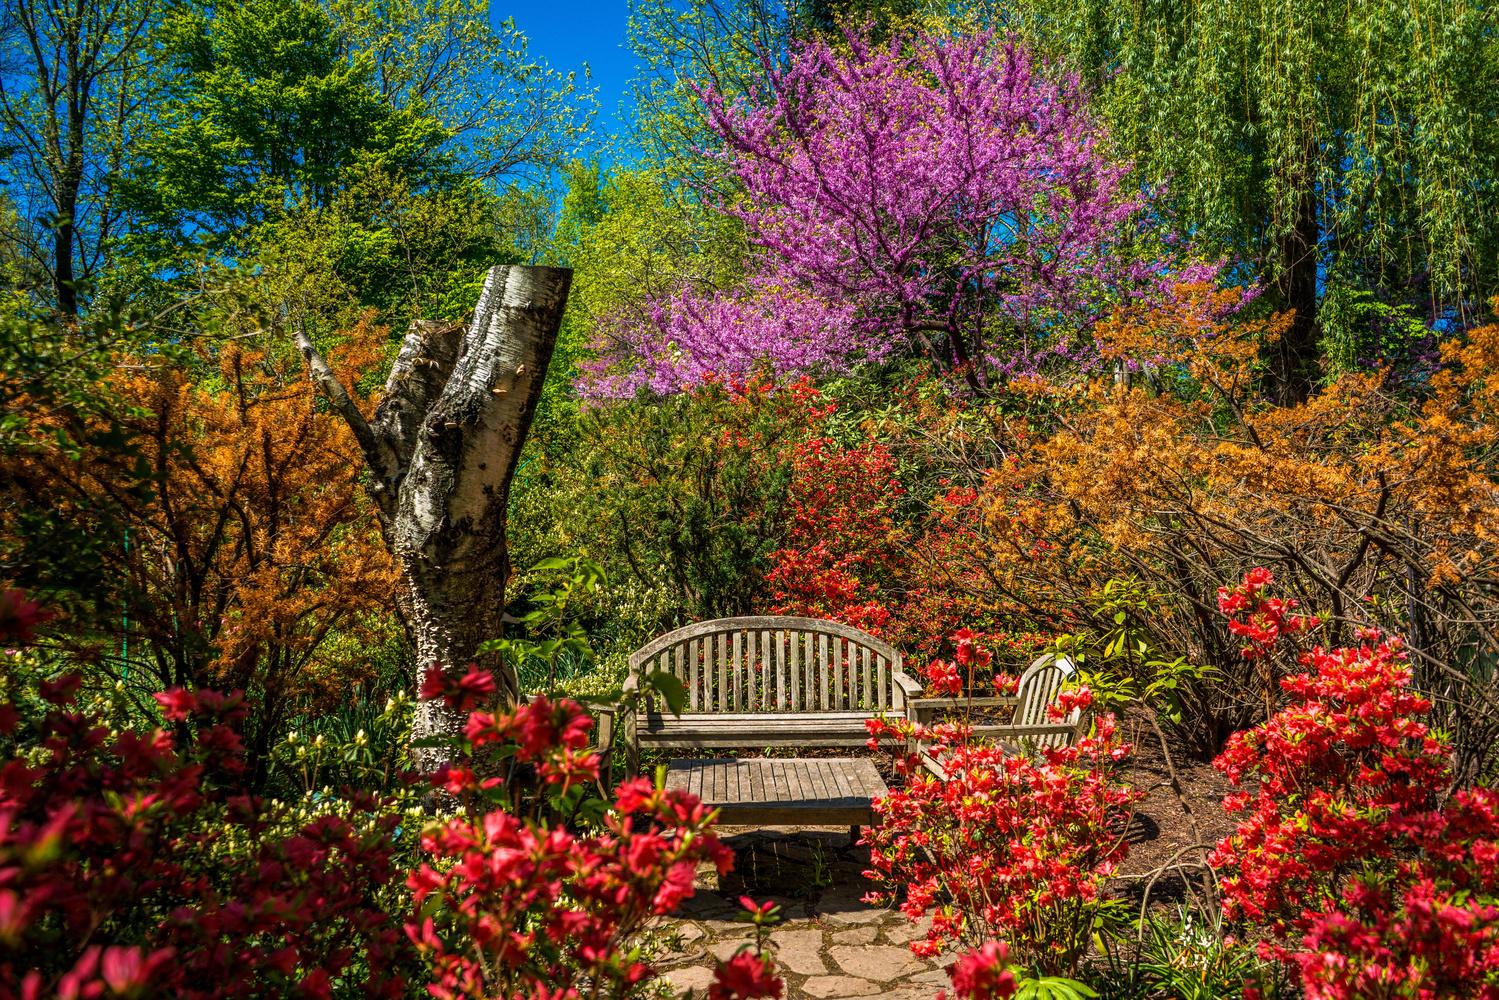 Sculpture Garden Bench by Luis Santana